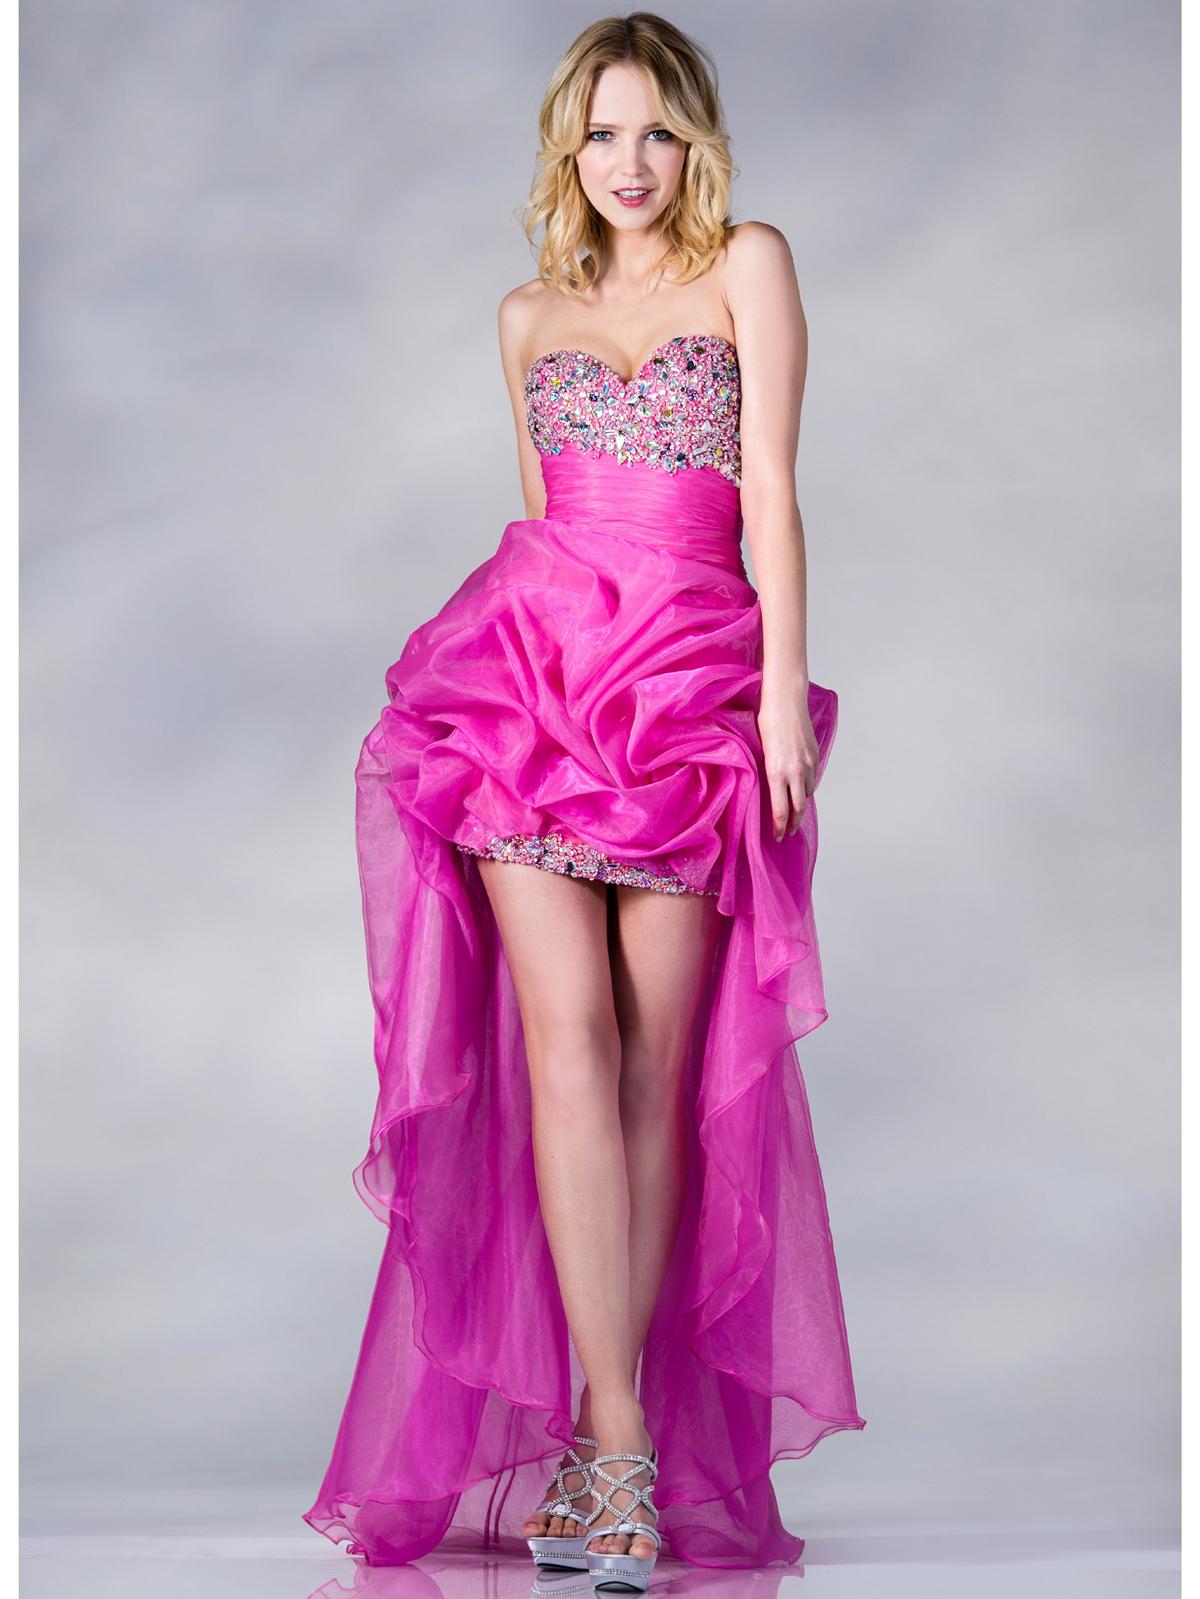 Formal Dresses in California | Dress images